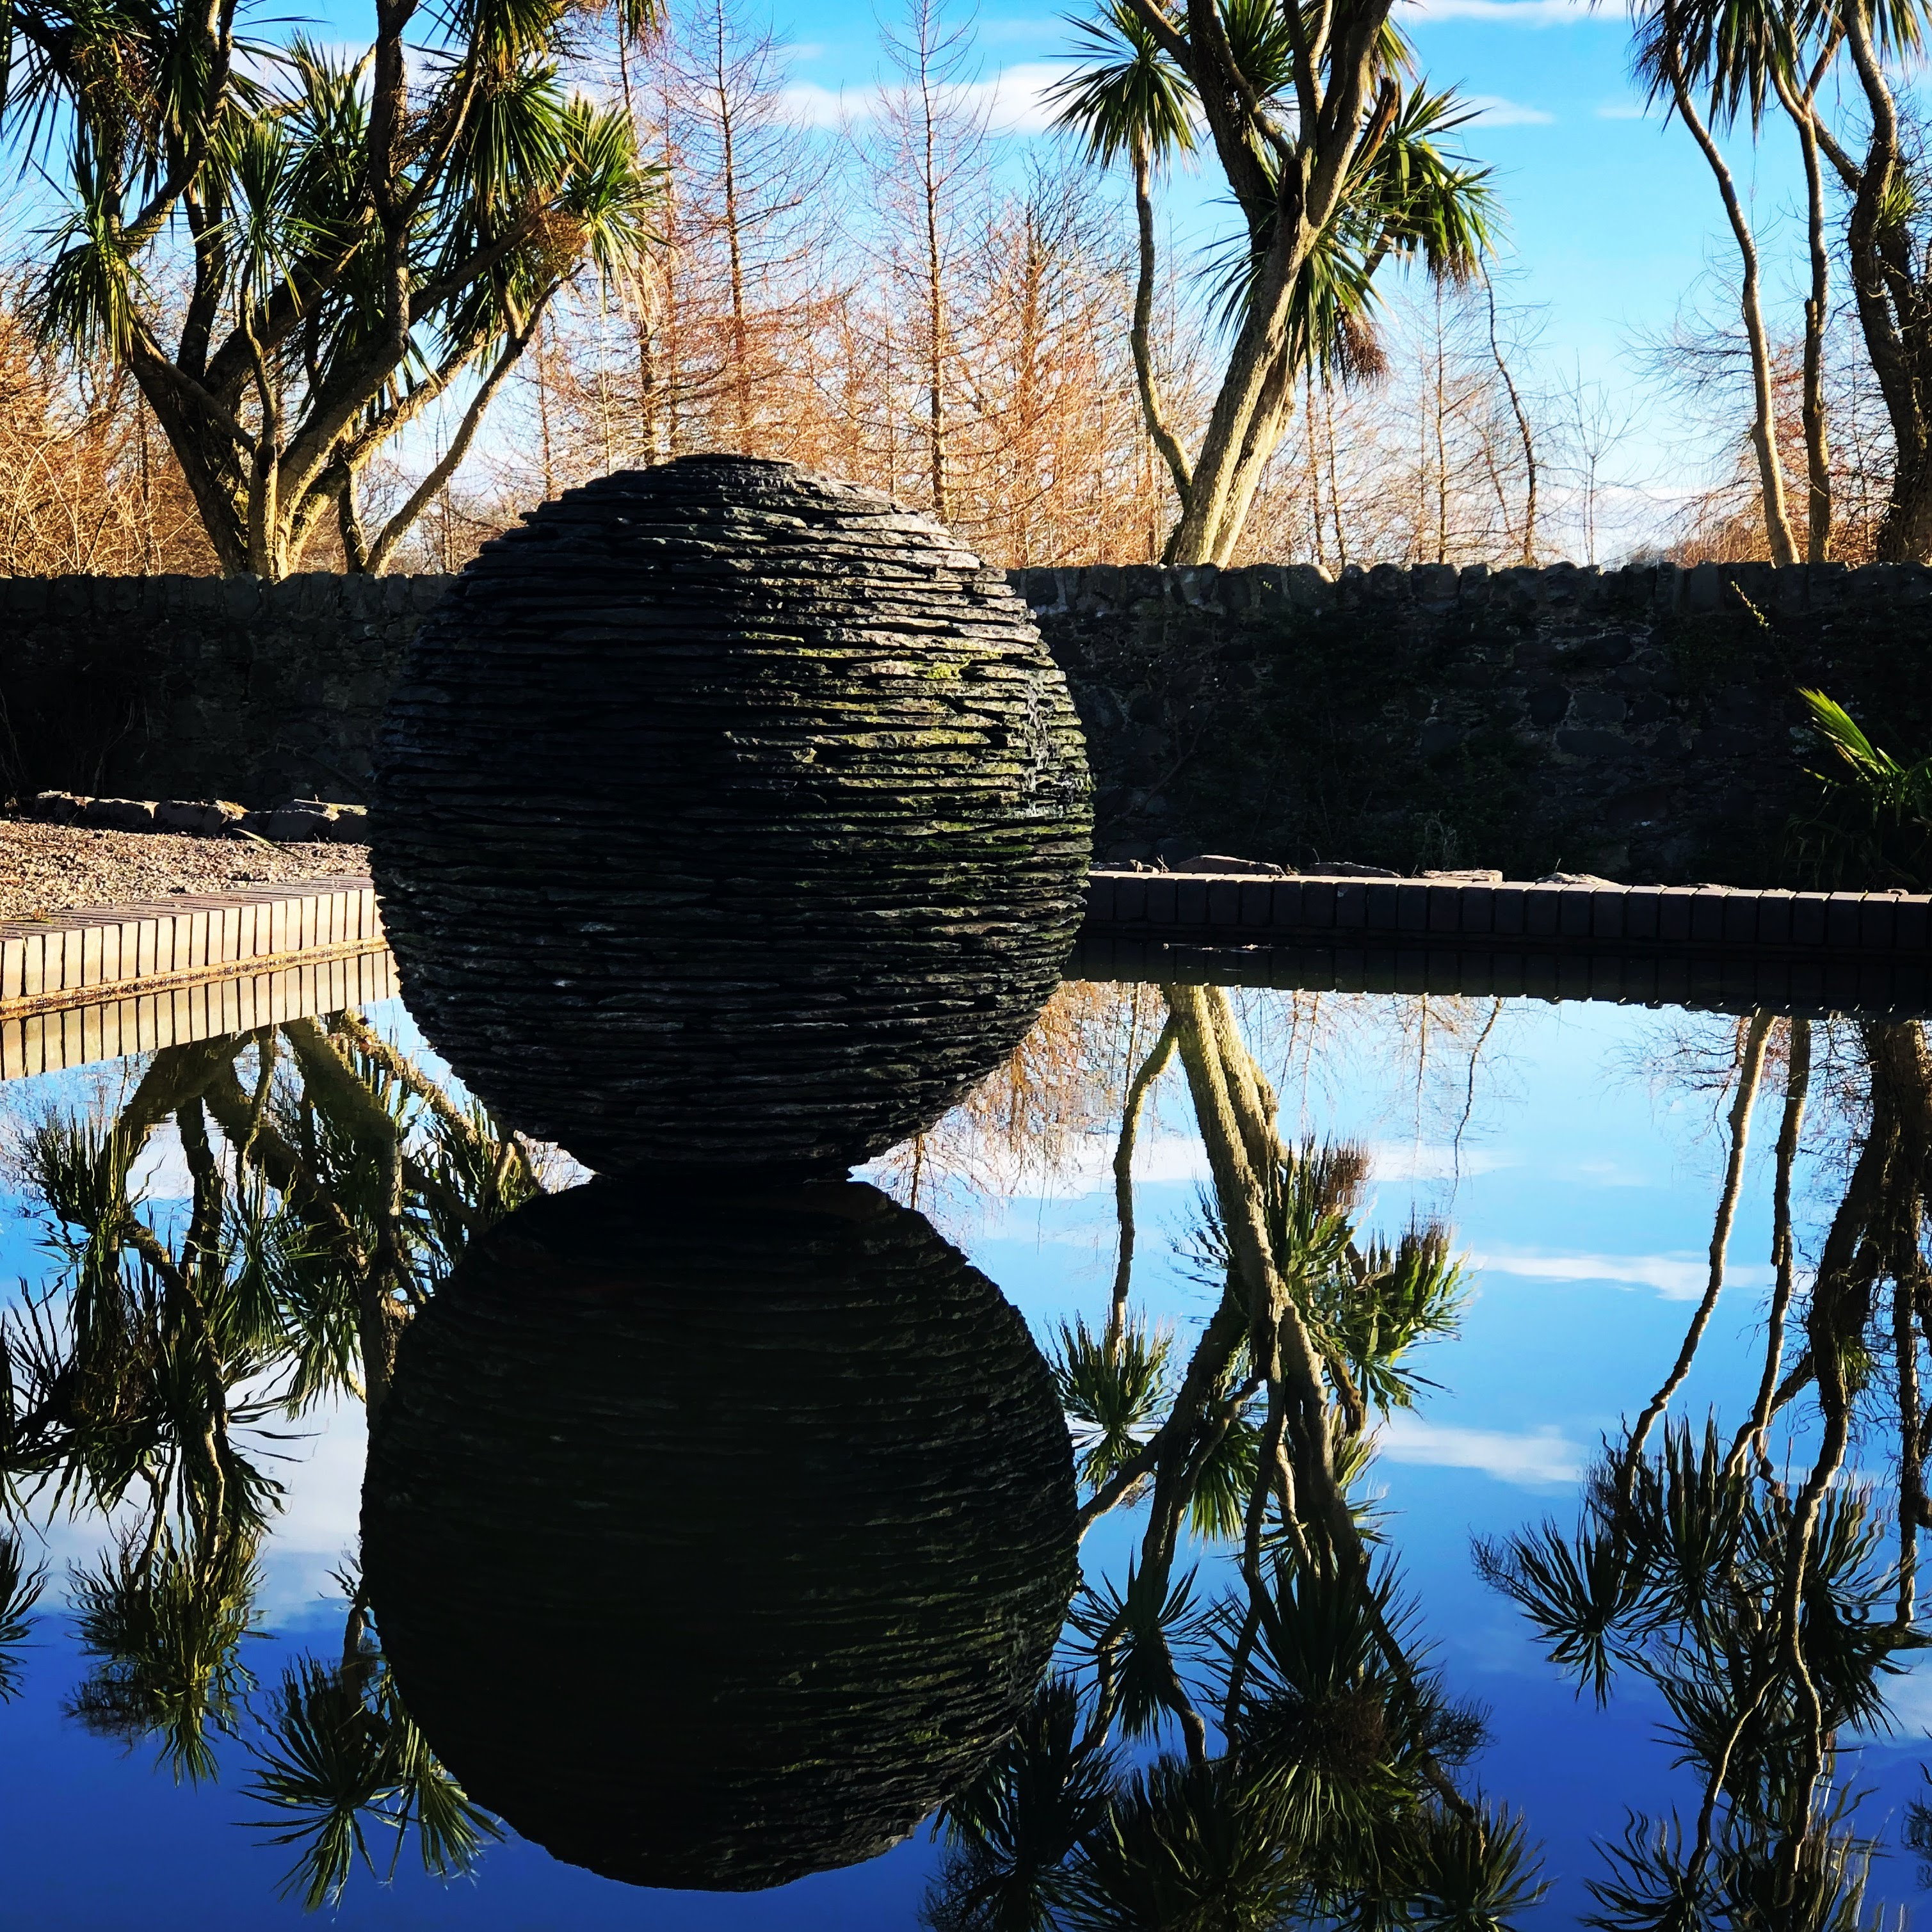 Summer Holiday Photography Workshops at Logan Botanic Garden